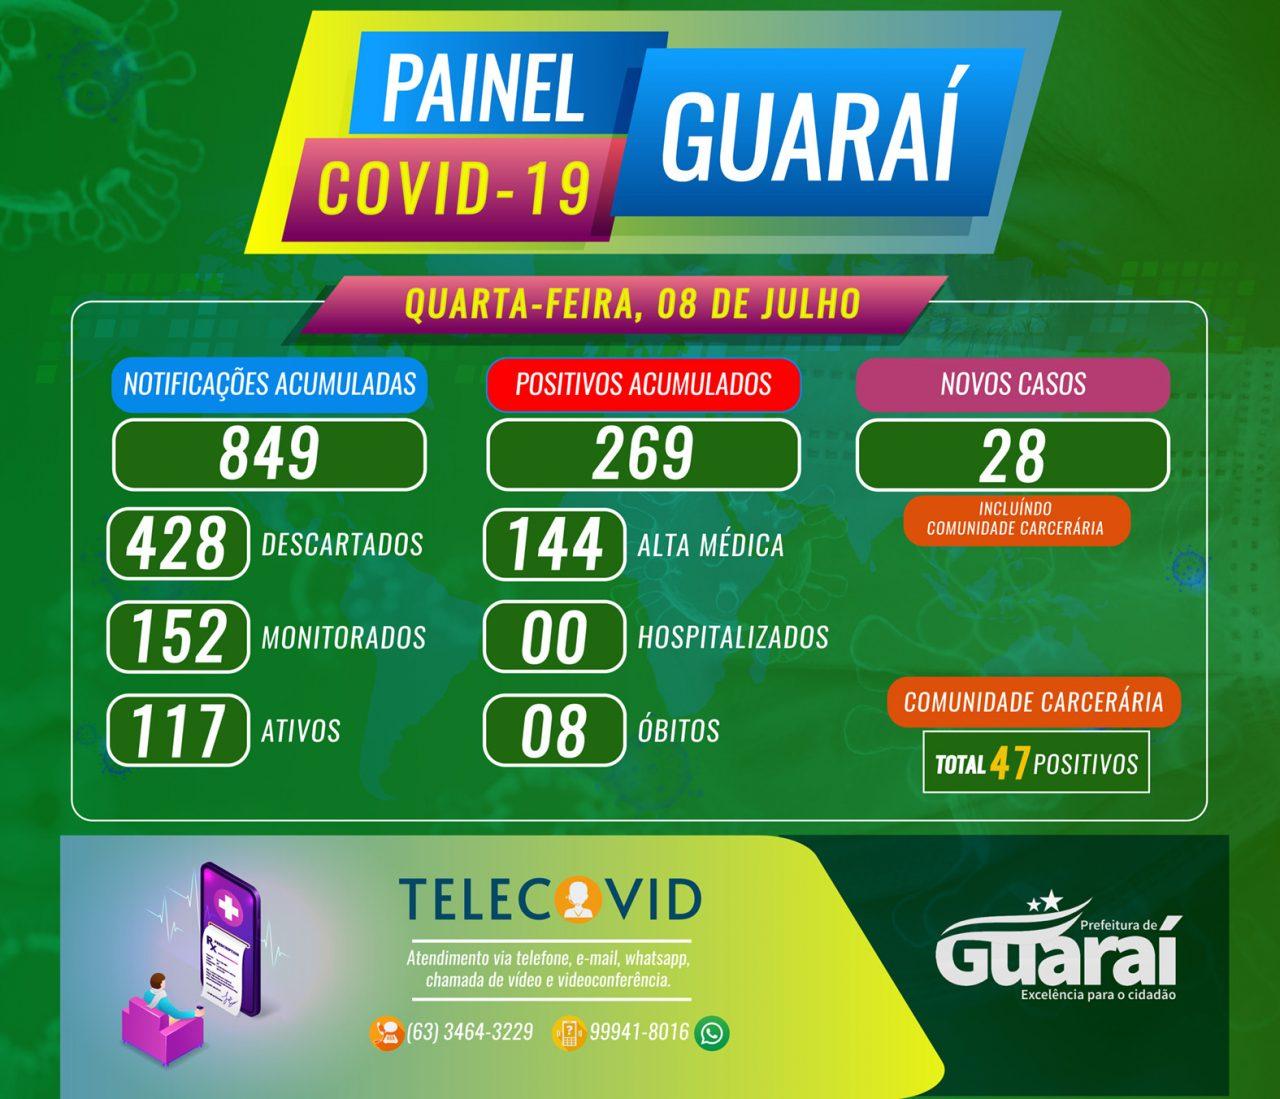 PAINEL GUARAI COVID19 QUARTA 8 DE JULHO 1280x1099 - PaineI Guaraí-TO / Covid-19 / Boletim 08 de Julho (Quarta) 16:00